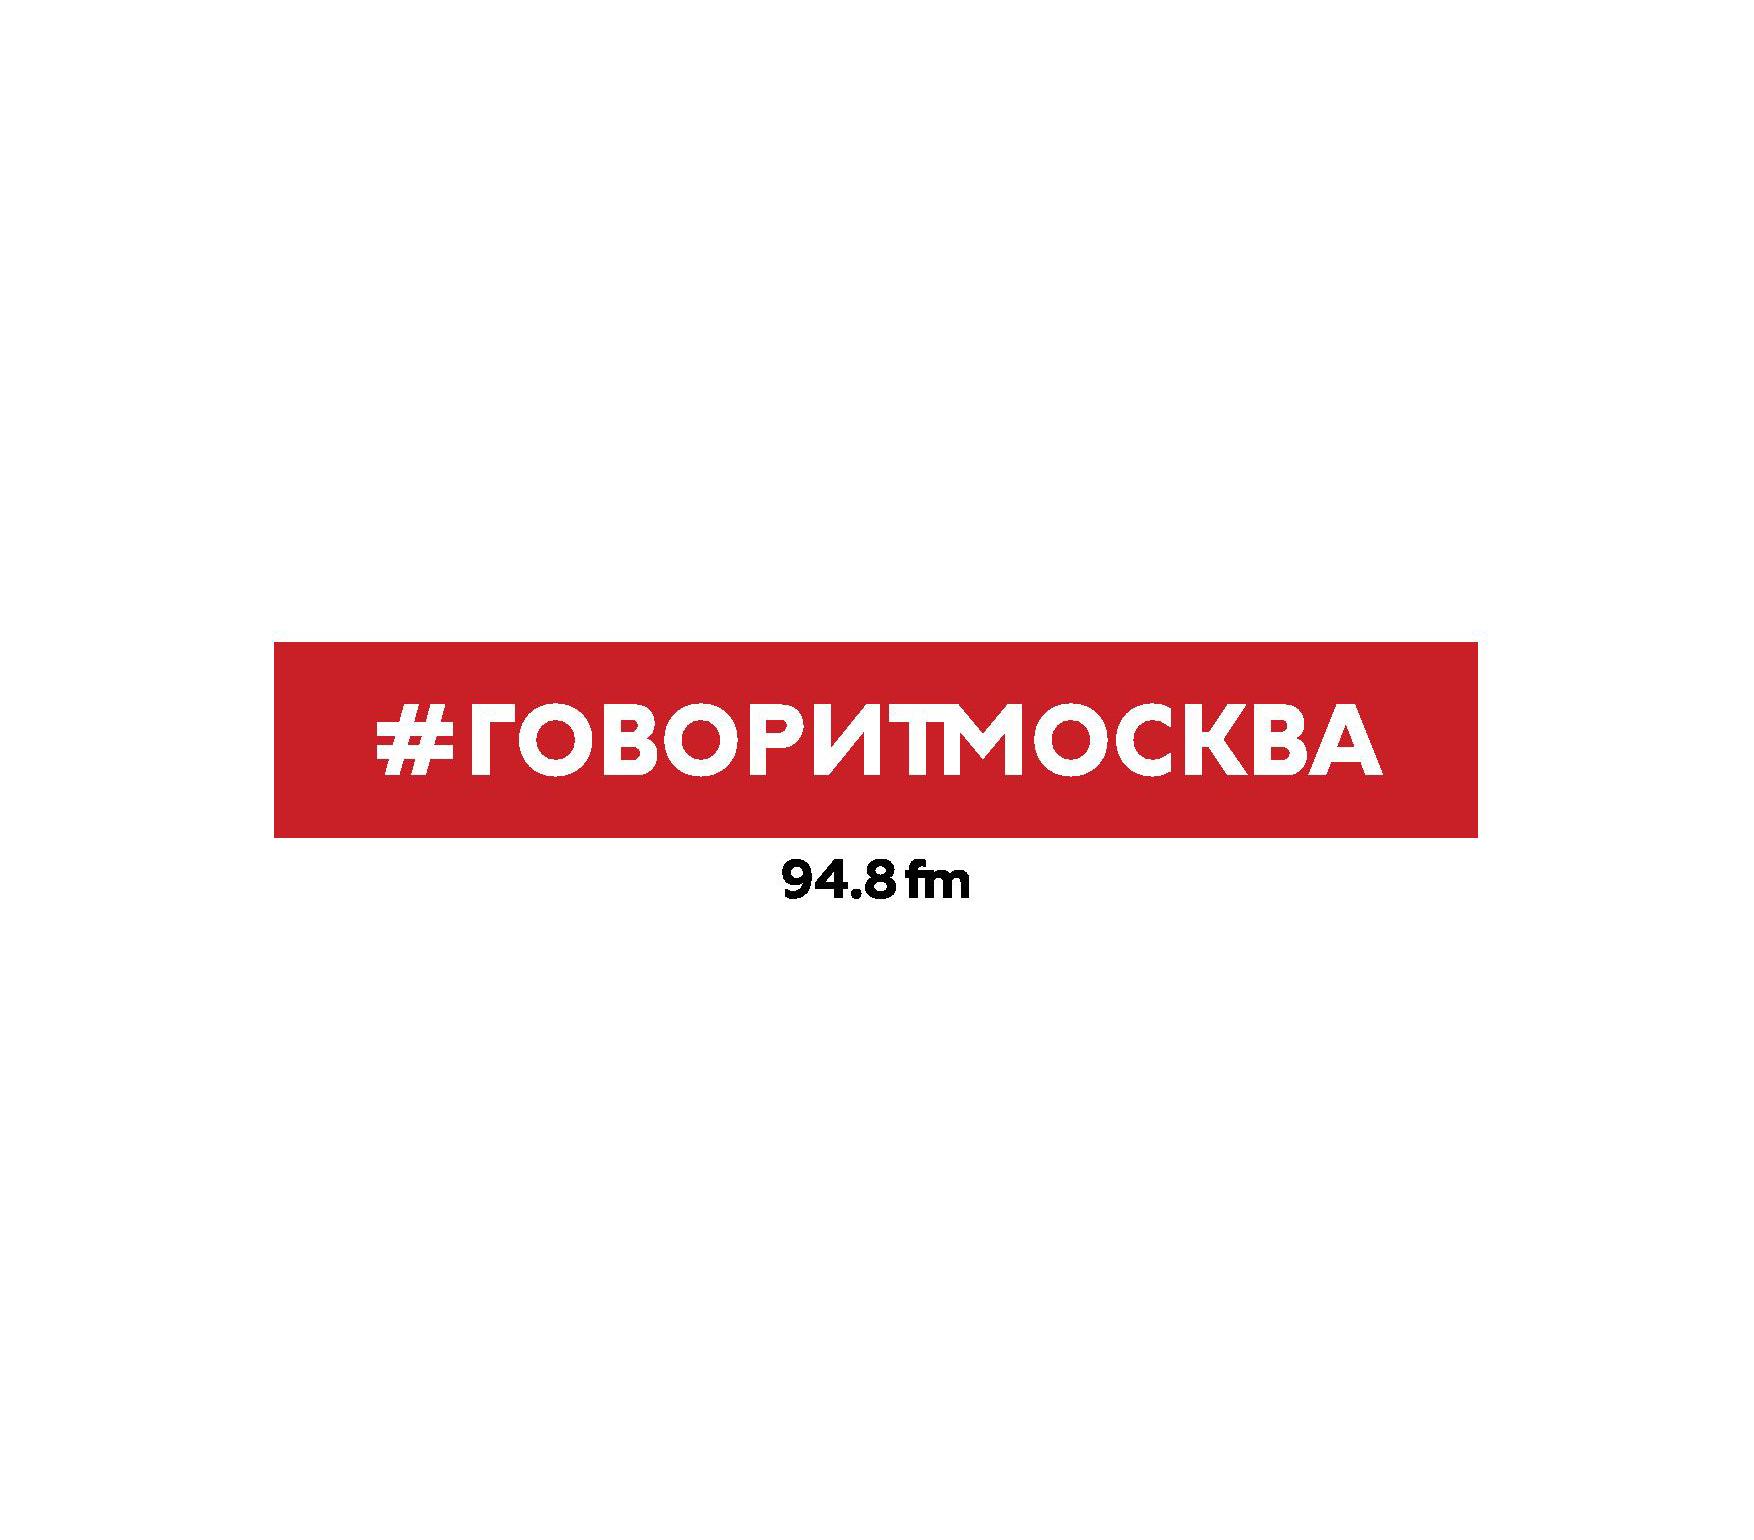 Макс Челноков 5 мая. Марат Гельман марат телемтаев